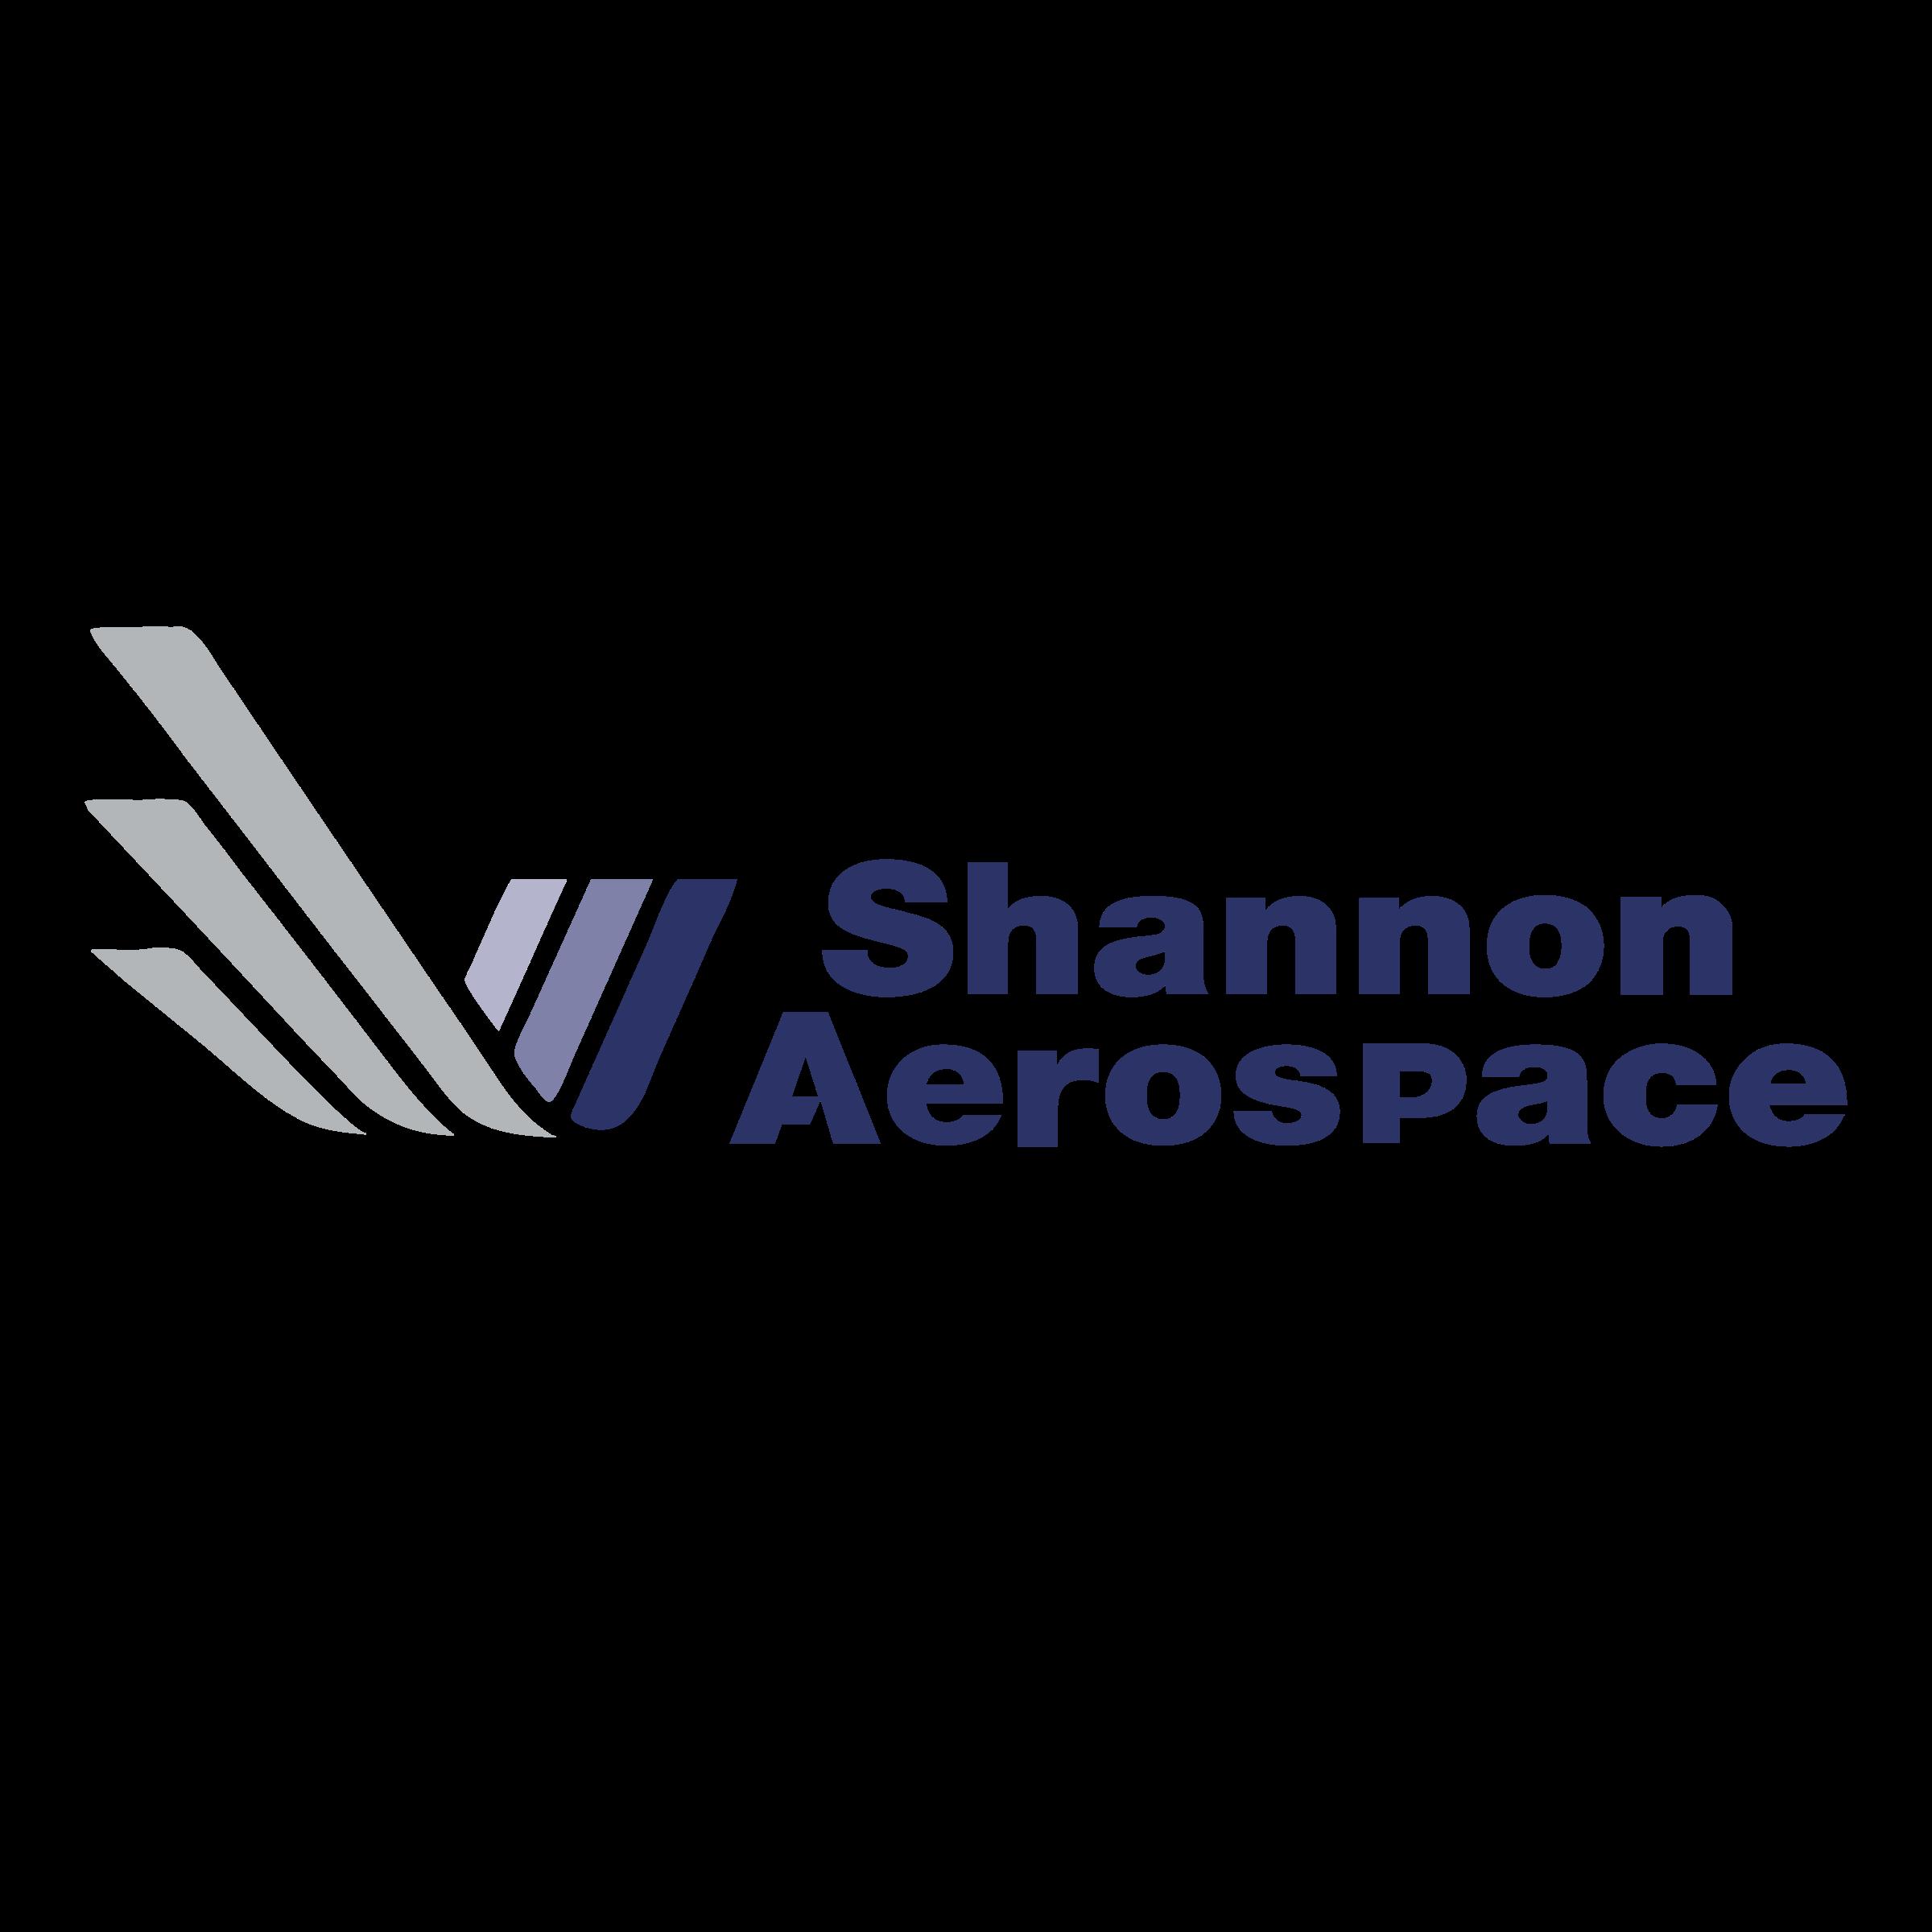 Shannon Aerospace logo